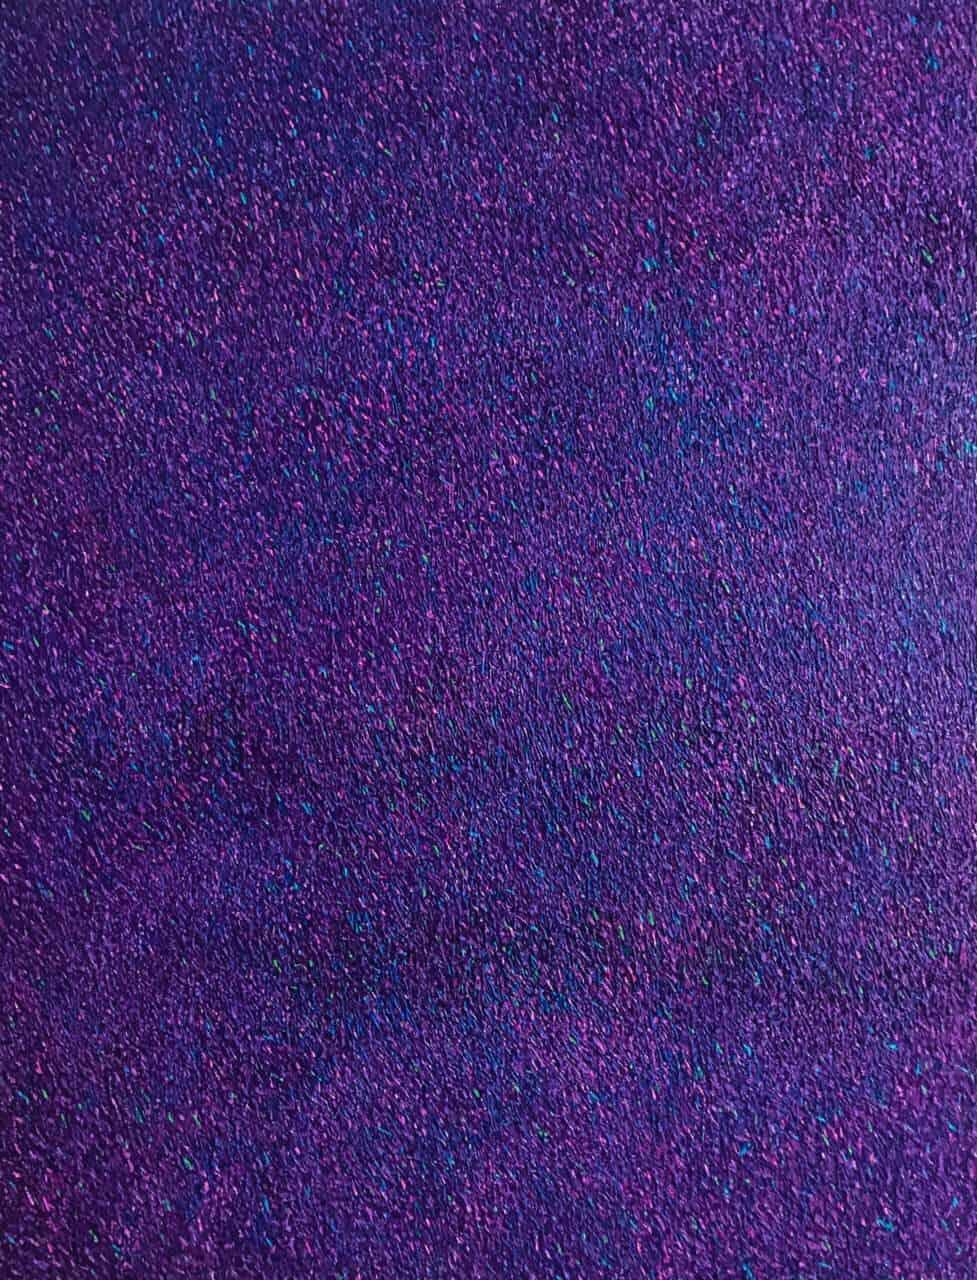 2017-21_sold_Purple-1_180x140cm_Acrylic-on-linen